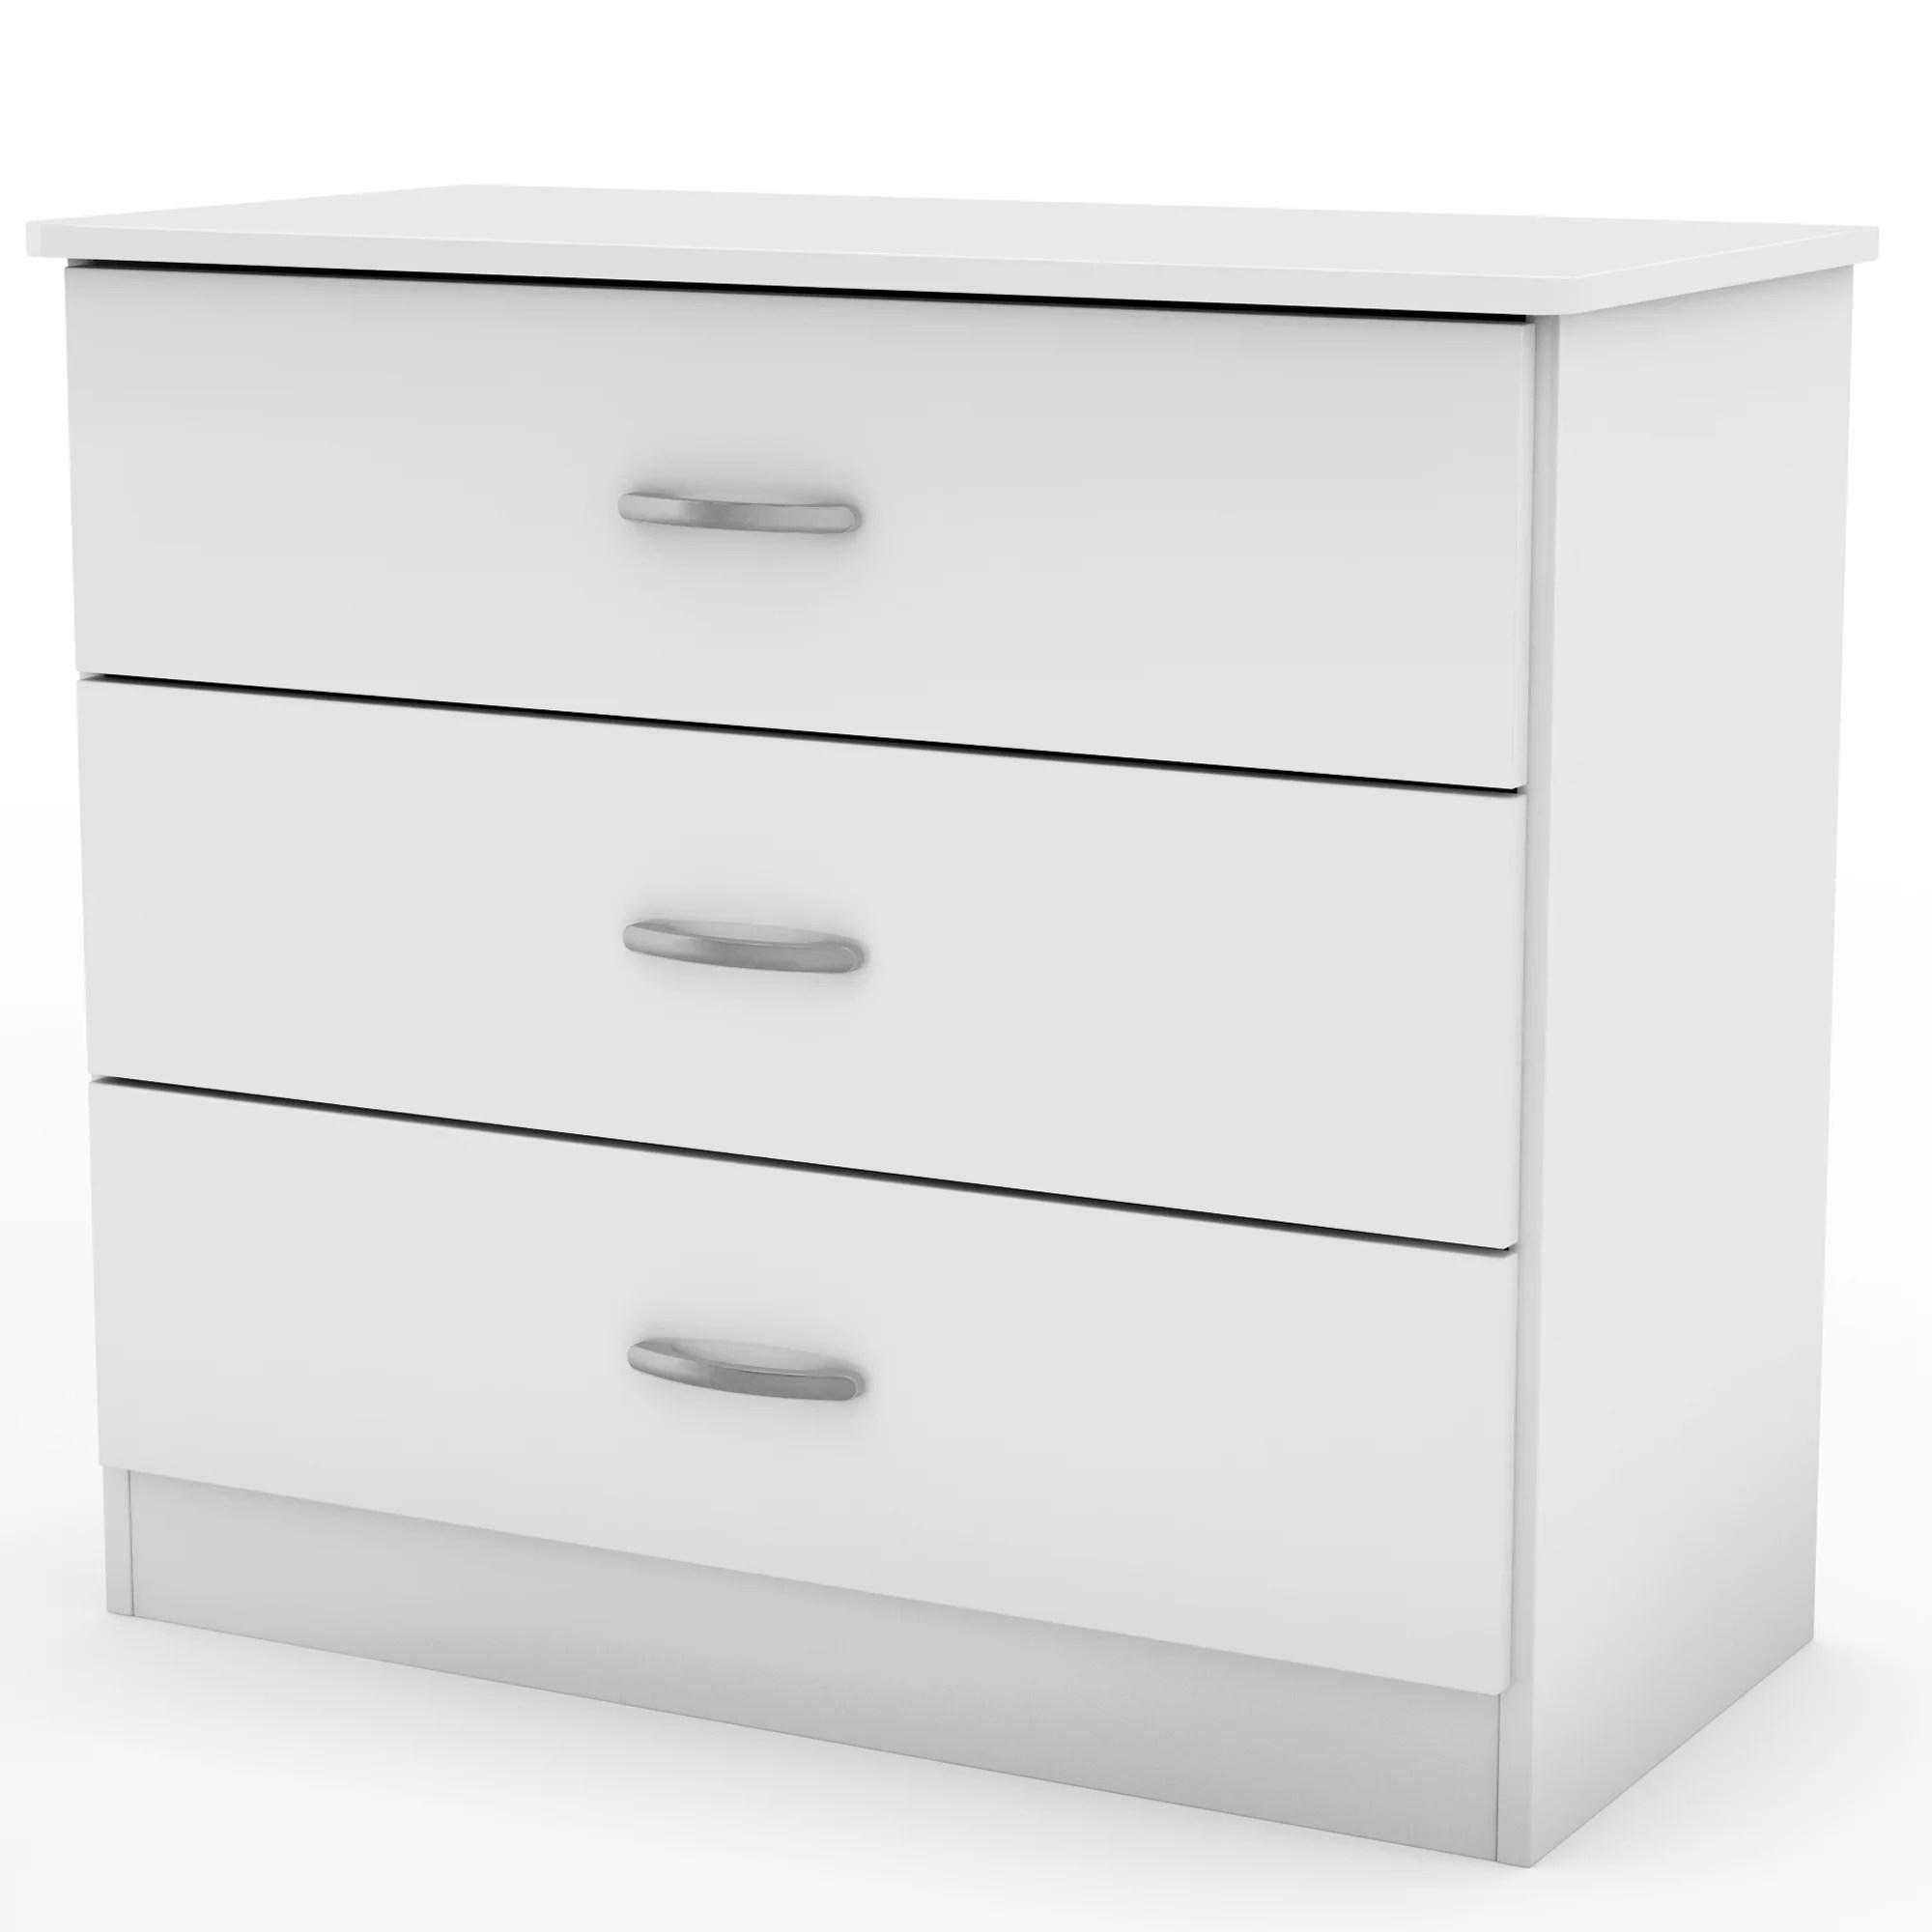 south shore smart basics 3 drawer chest multiple finishes